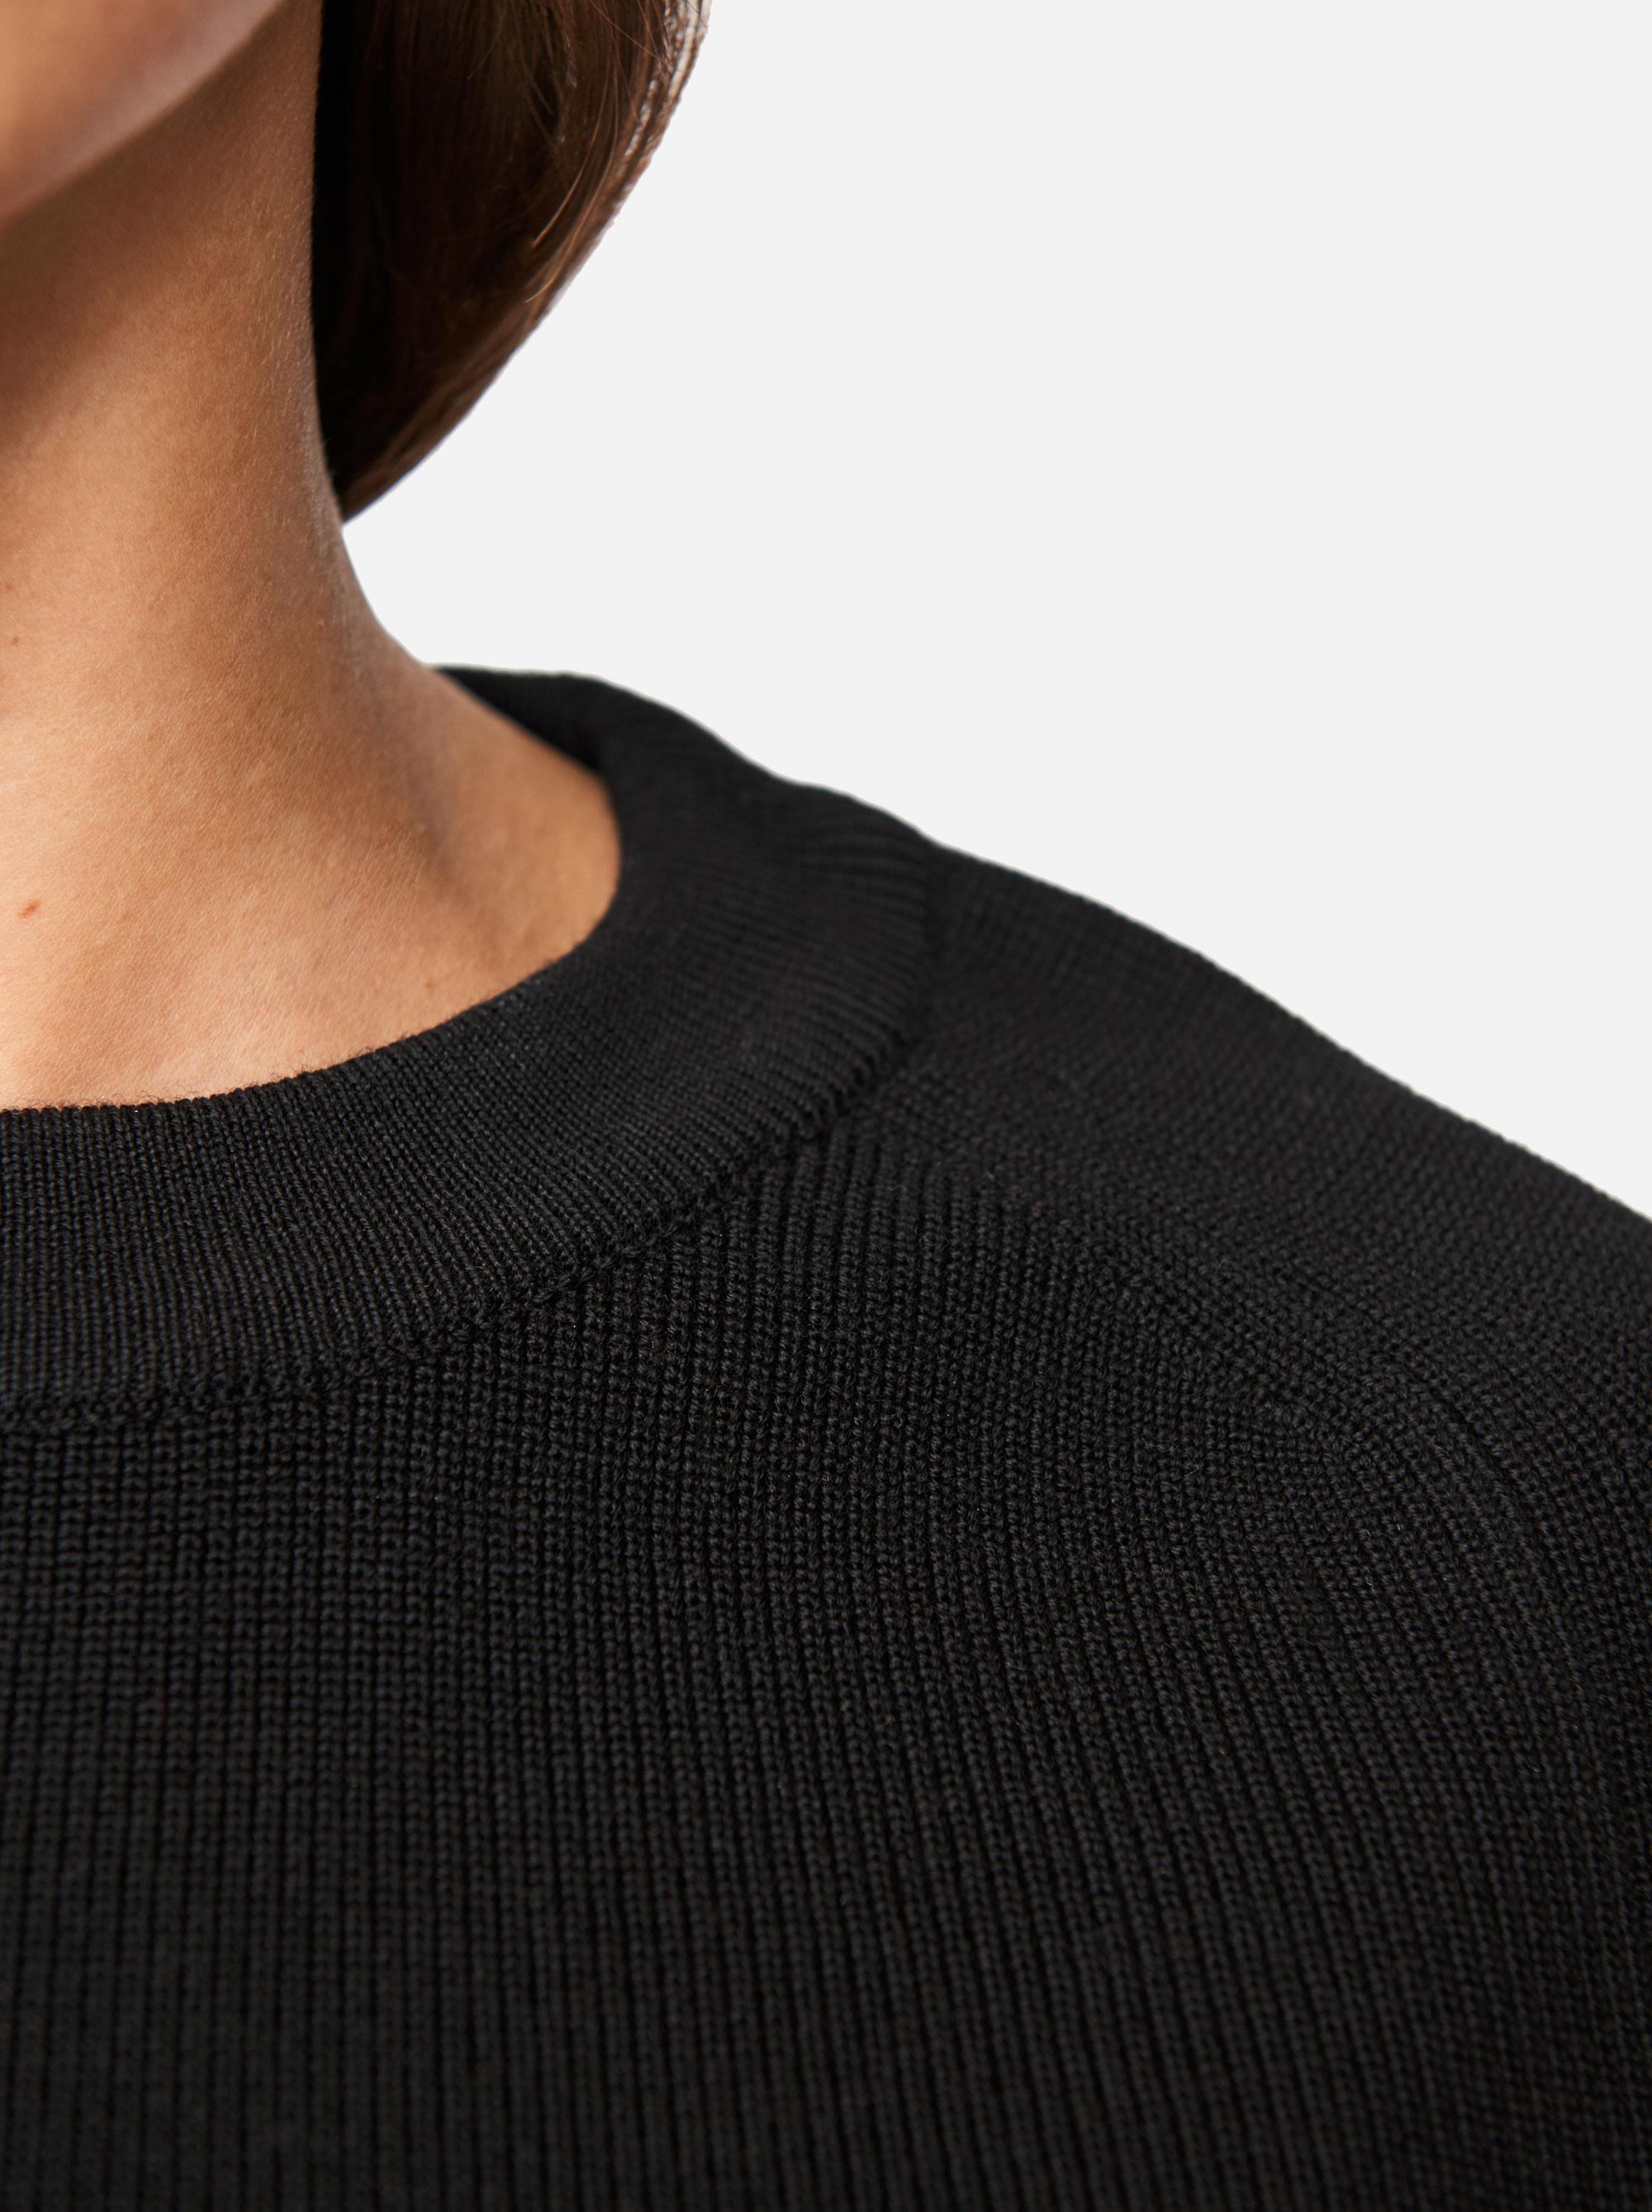 Teym - Crewneck - The Merino Sweater - Women - Black - 3